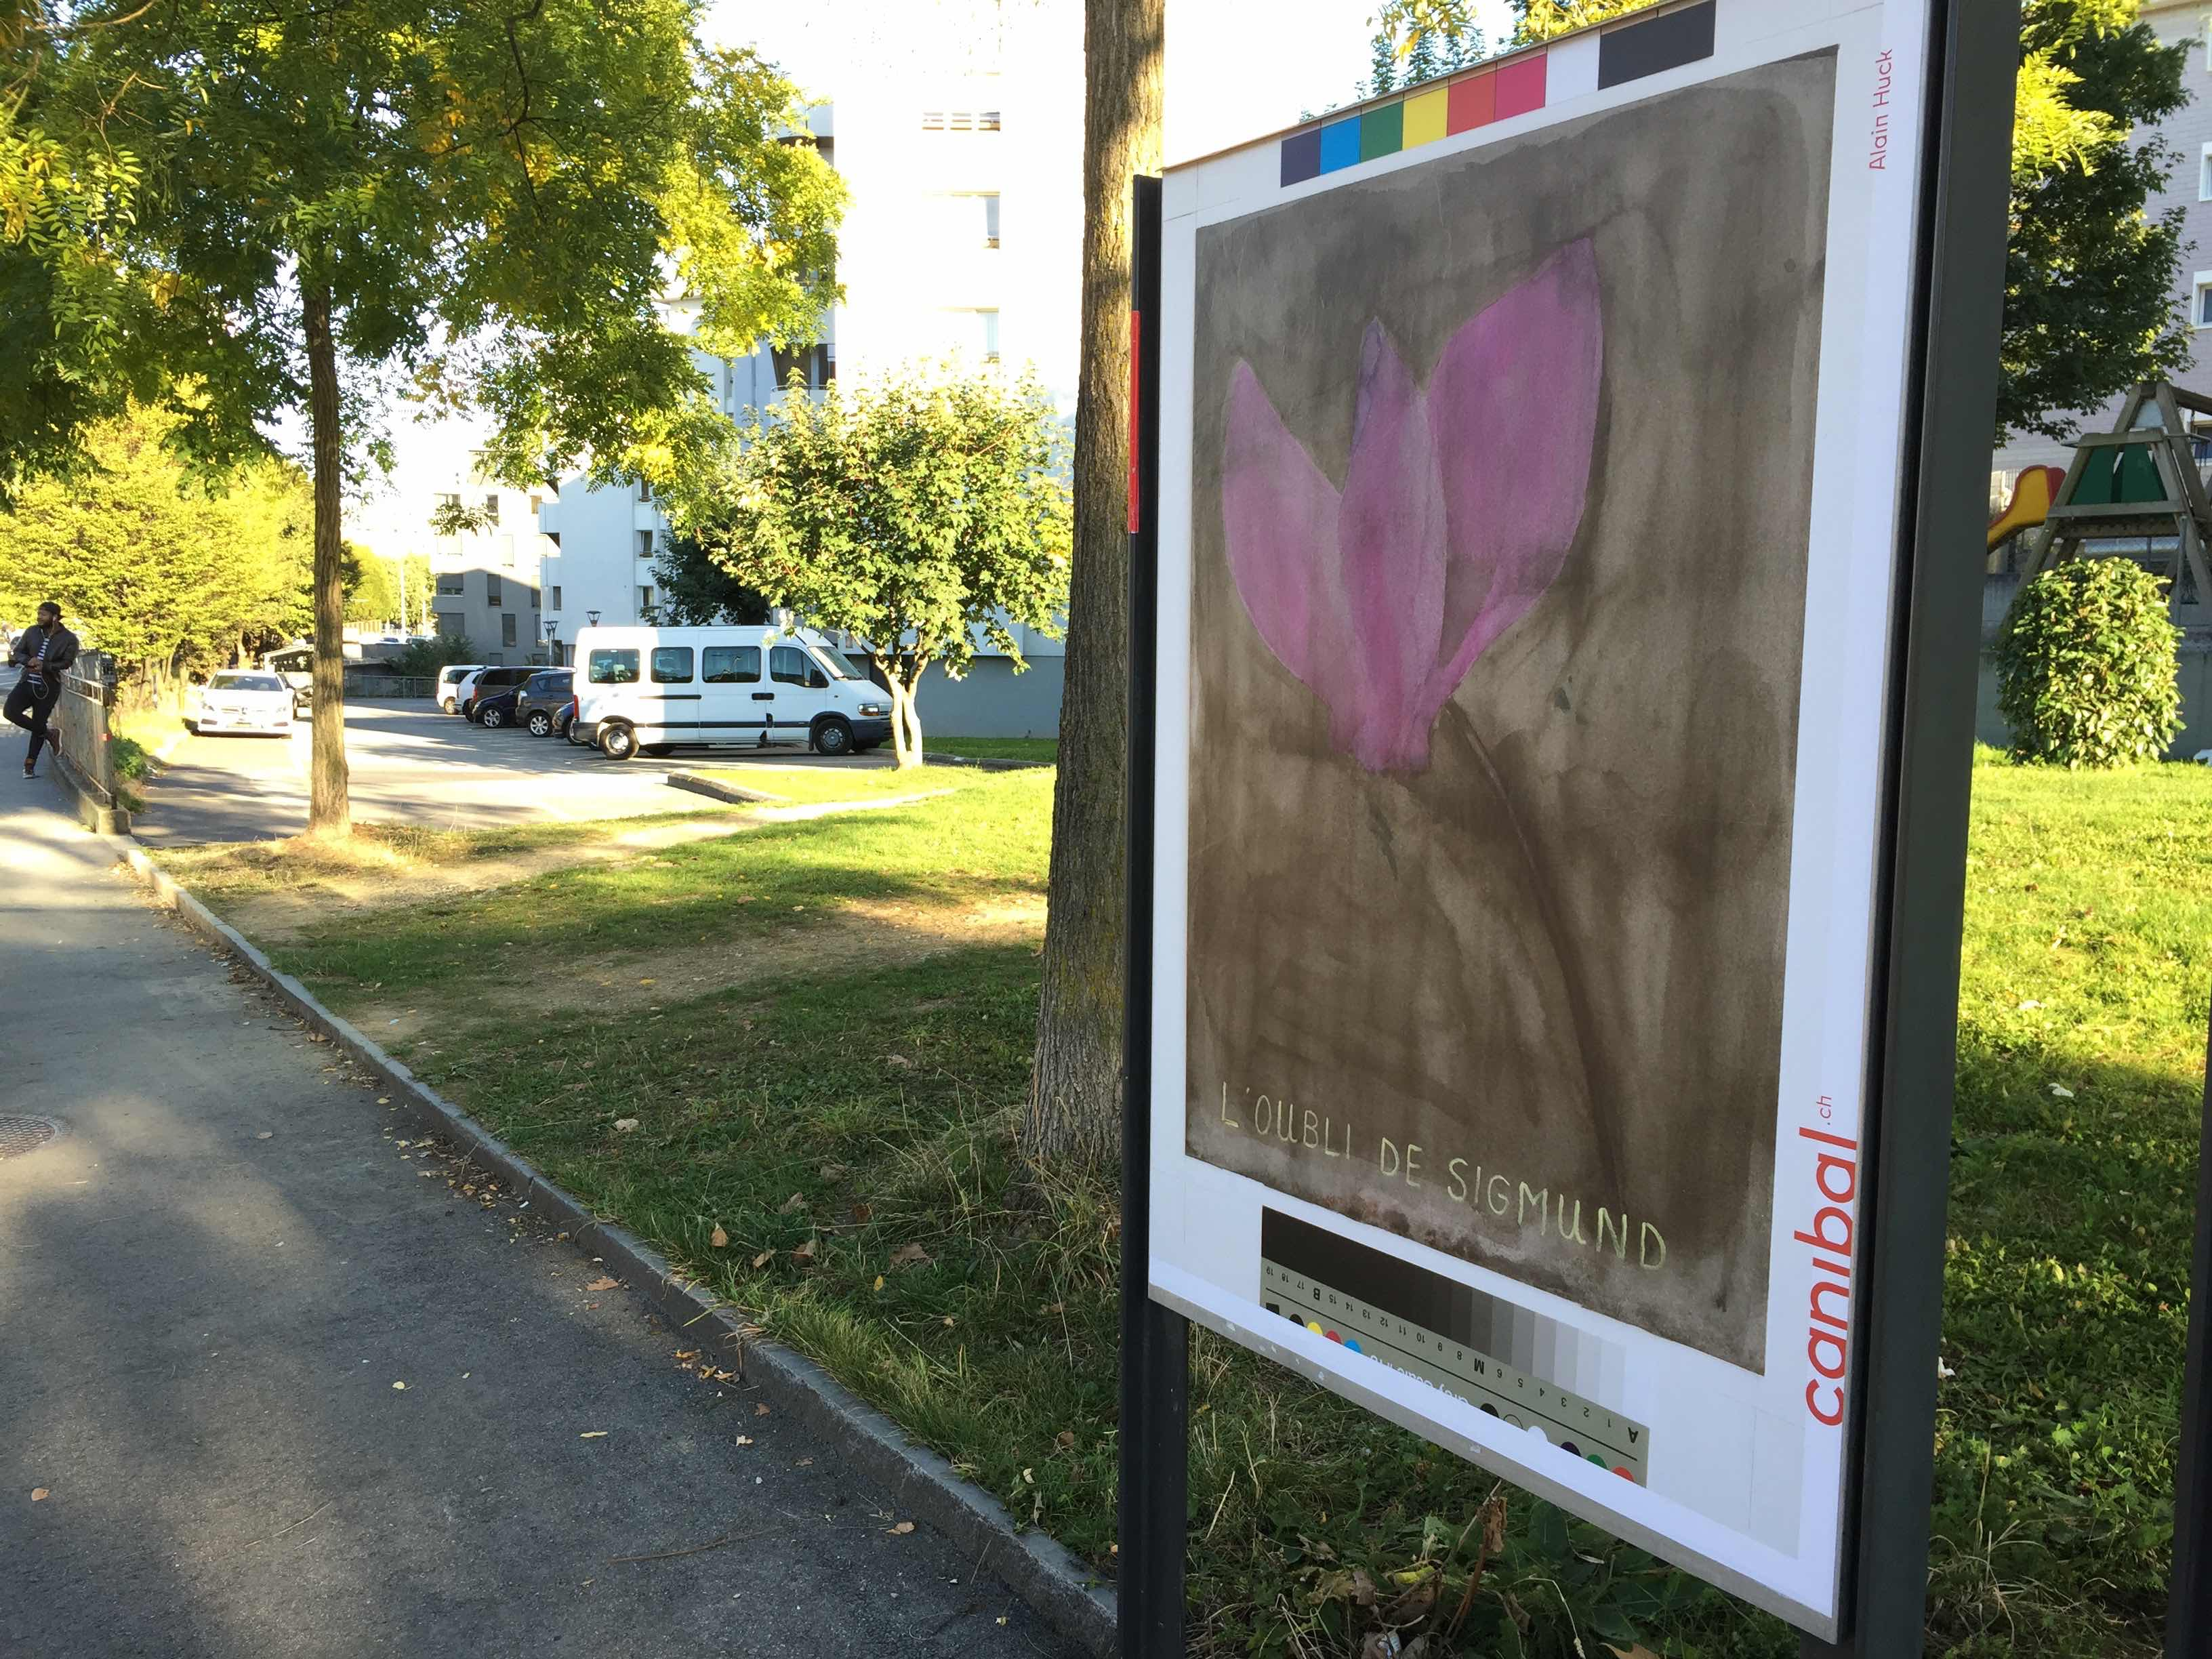 Alain Huck, avenue de provence 51, Lausanne-IMG_5947